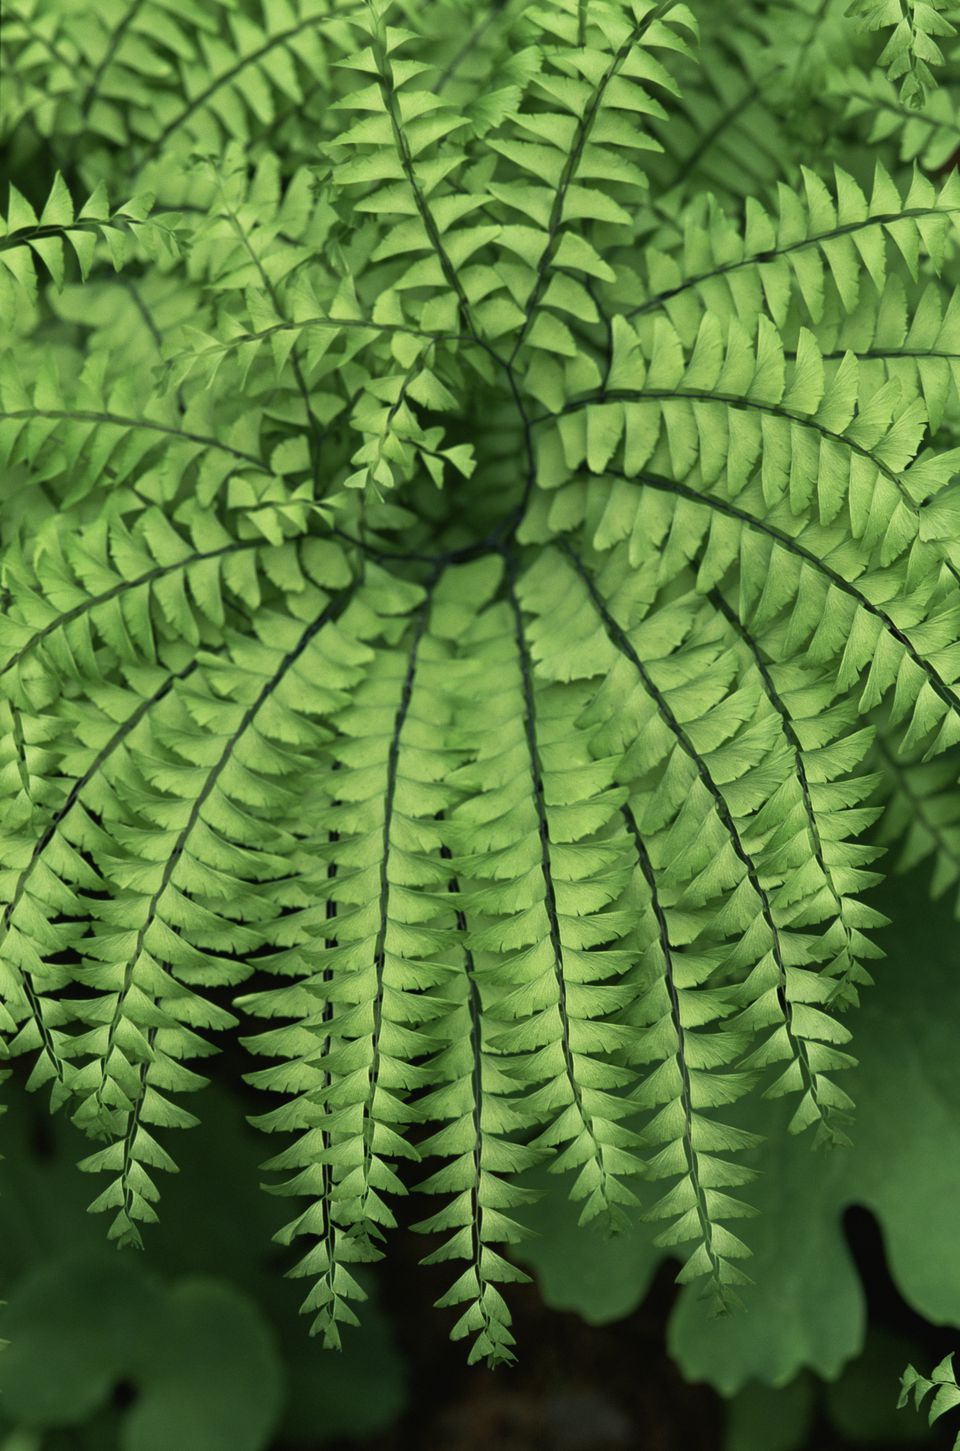 Adiantum pedantum or maidenhair fern